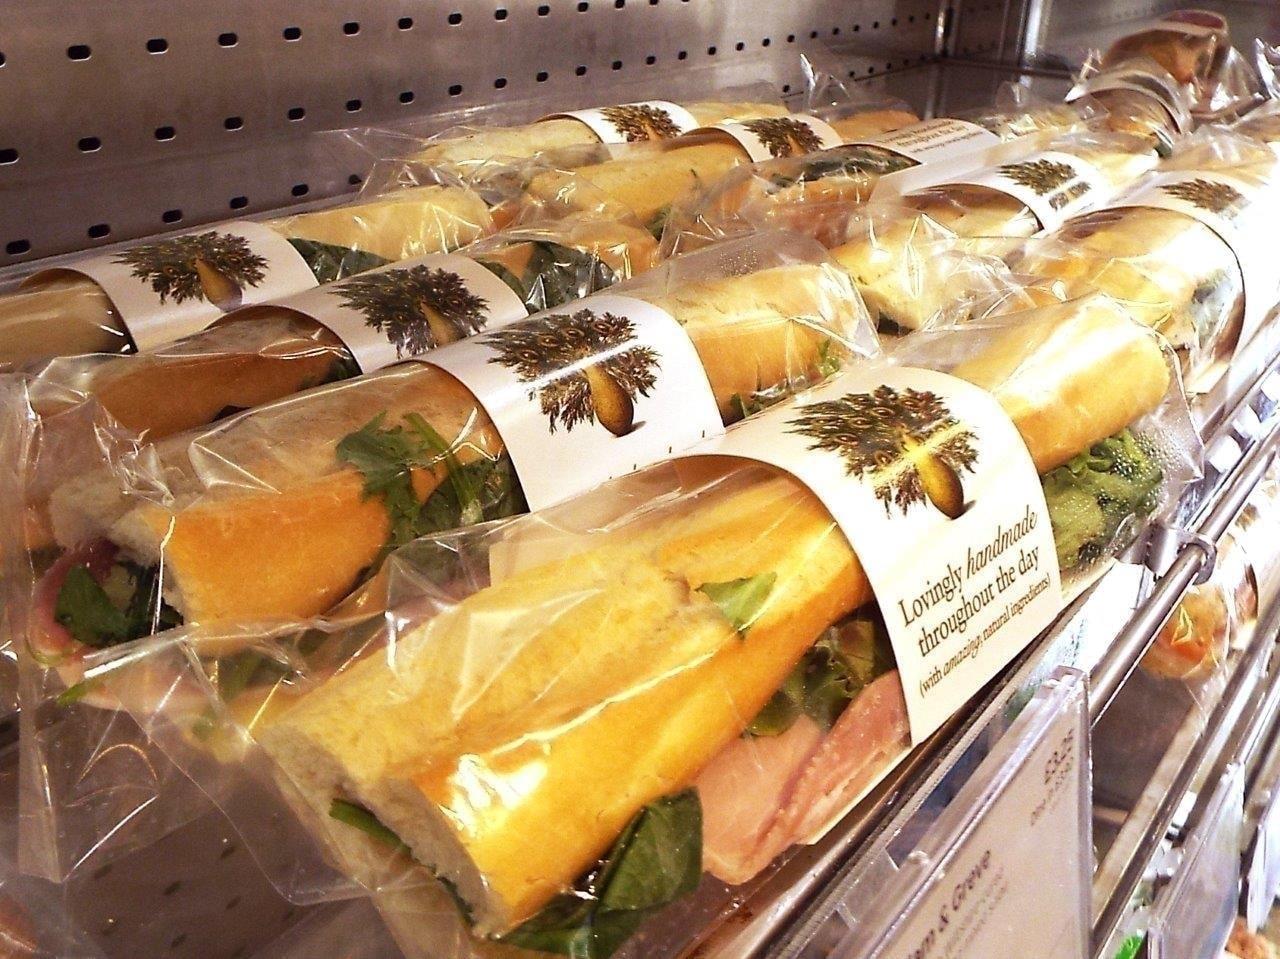 Pret chicken casear baguette